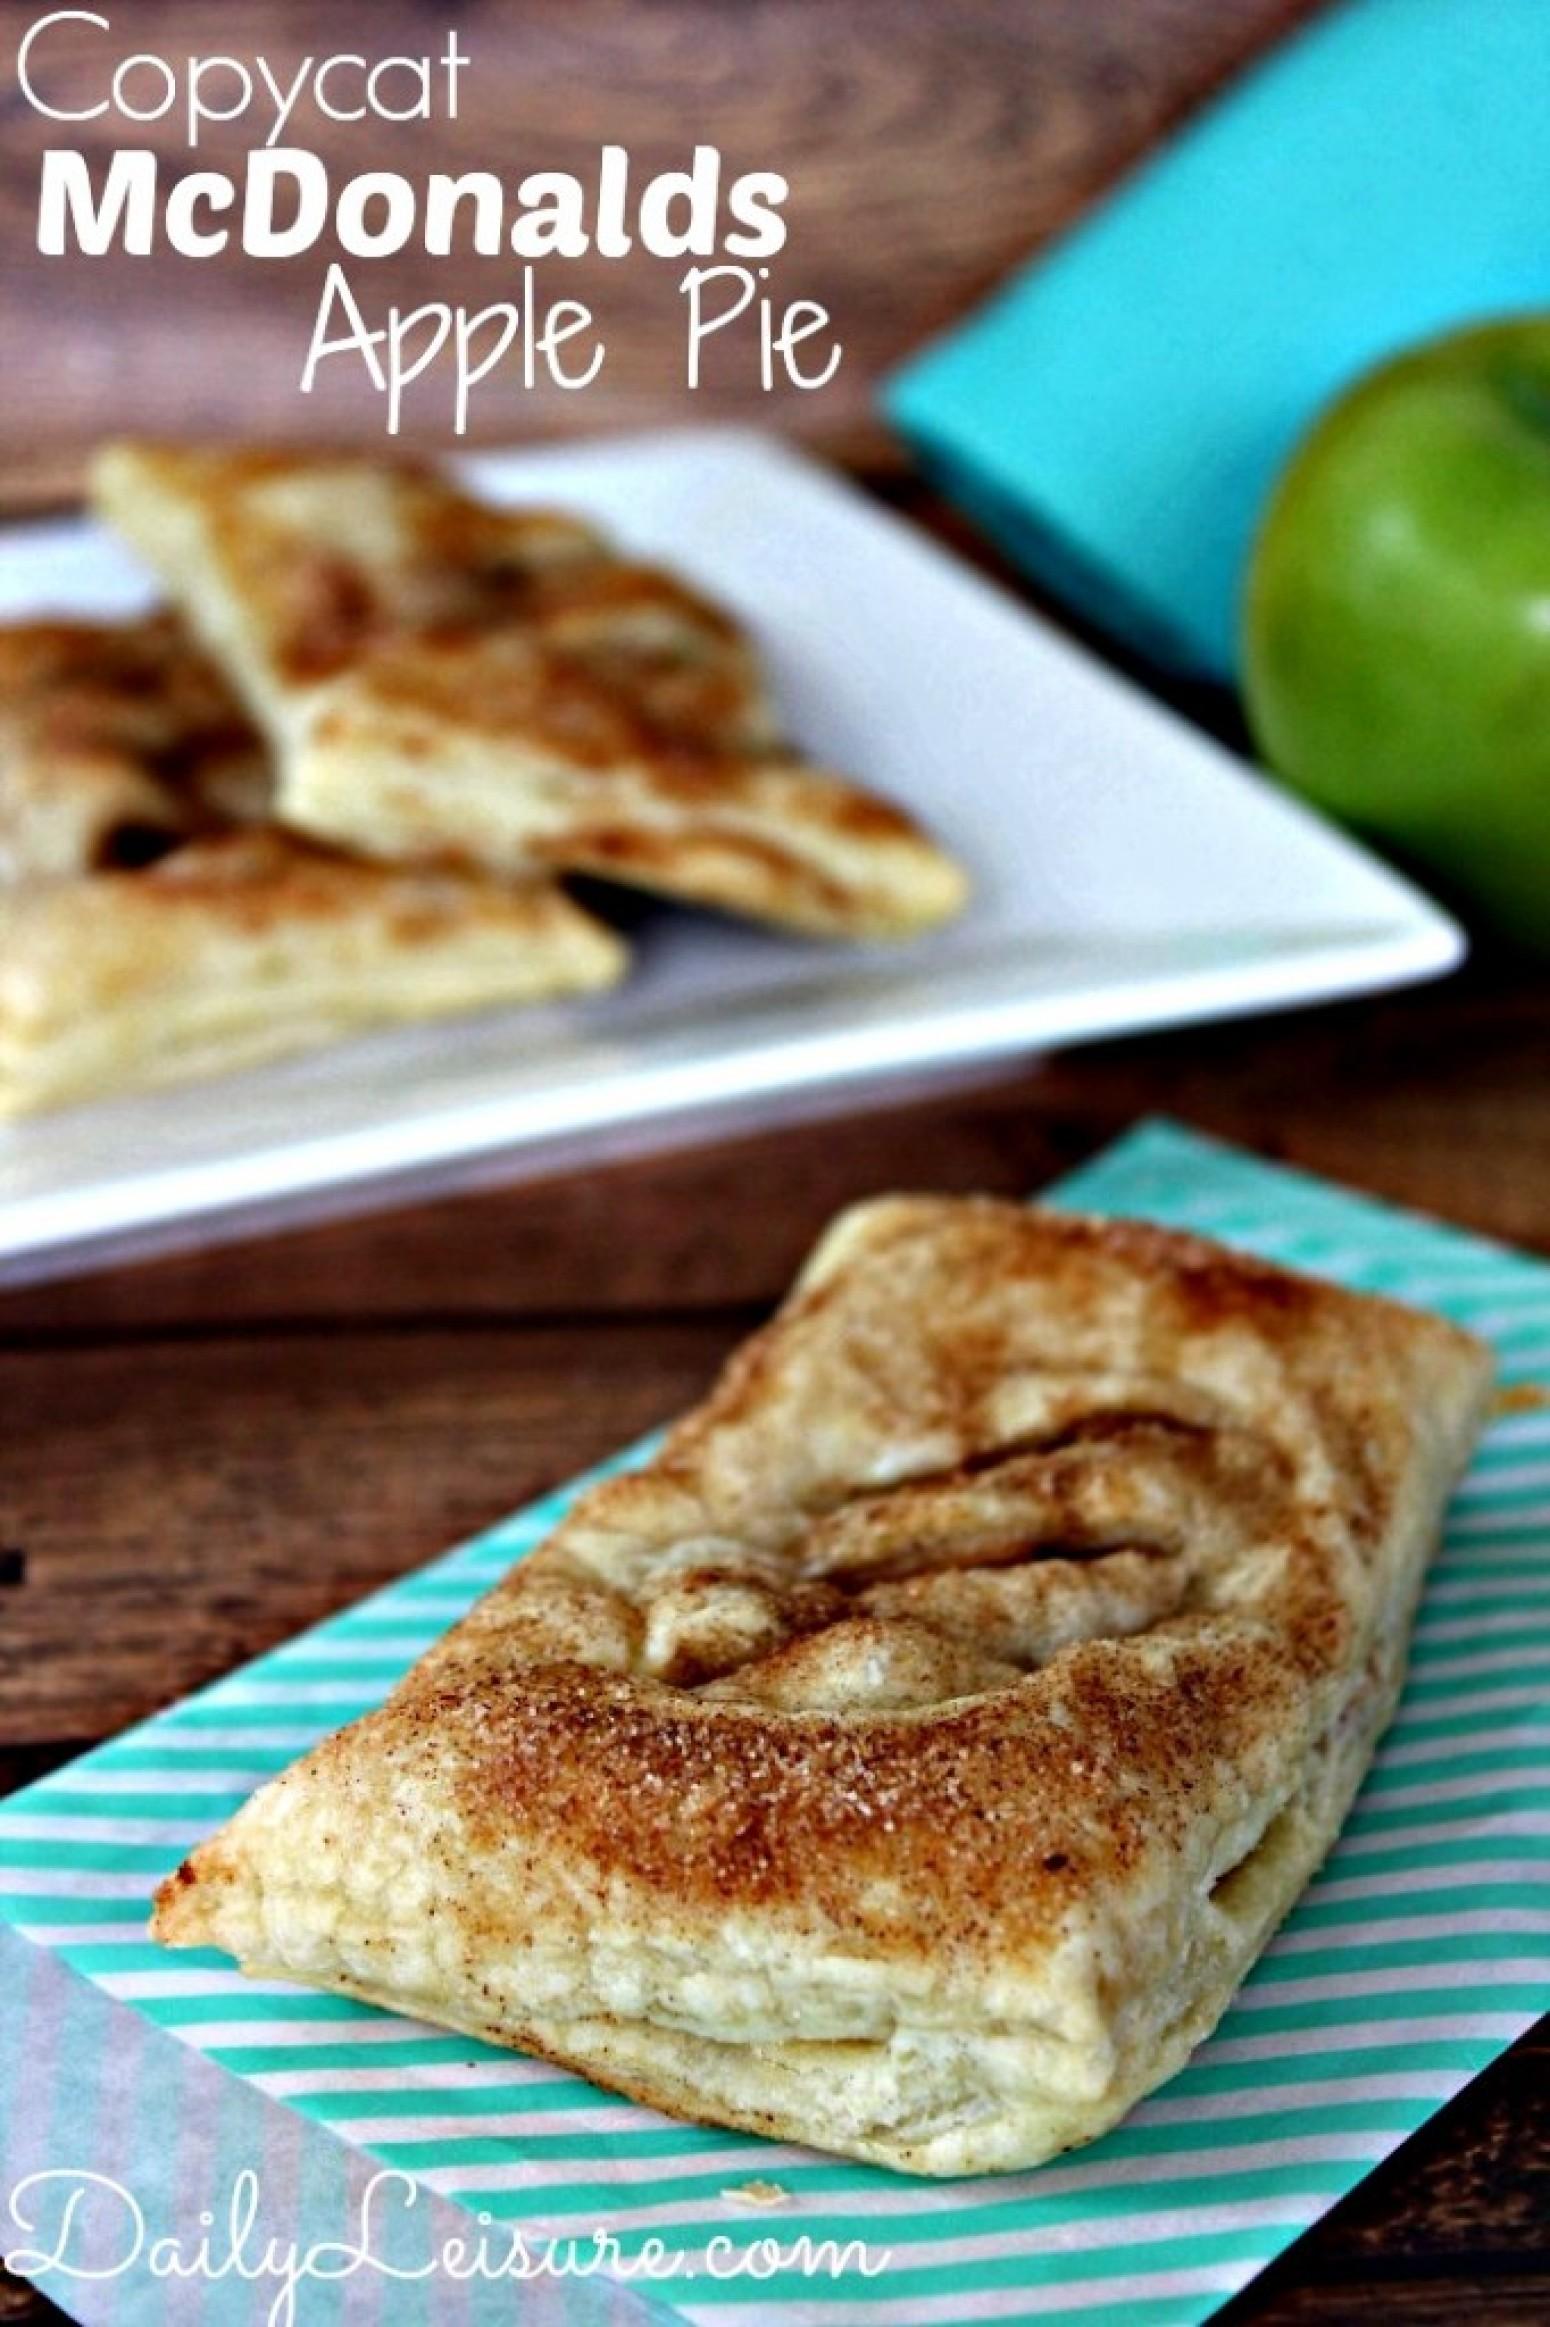 Copycat McDonalds Apple Pie Recipe | Just A Pinch Recipes